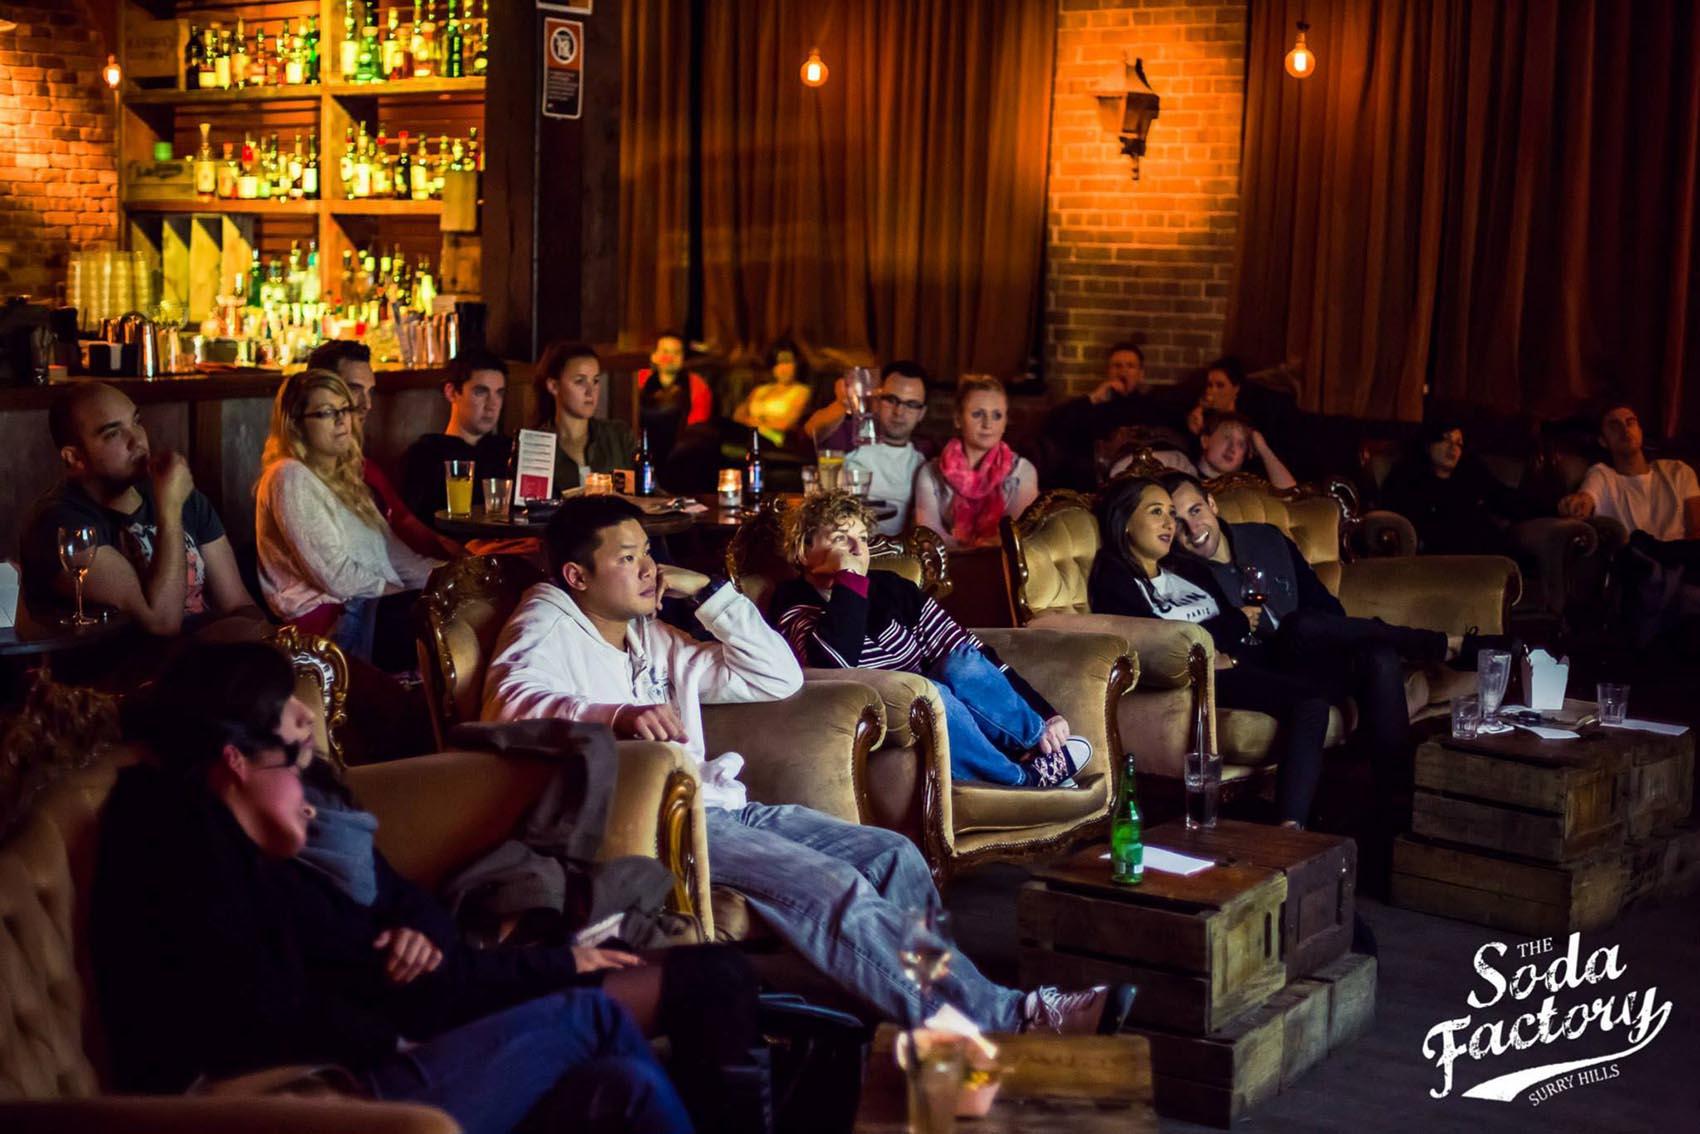 movie-night-at-soda-factory